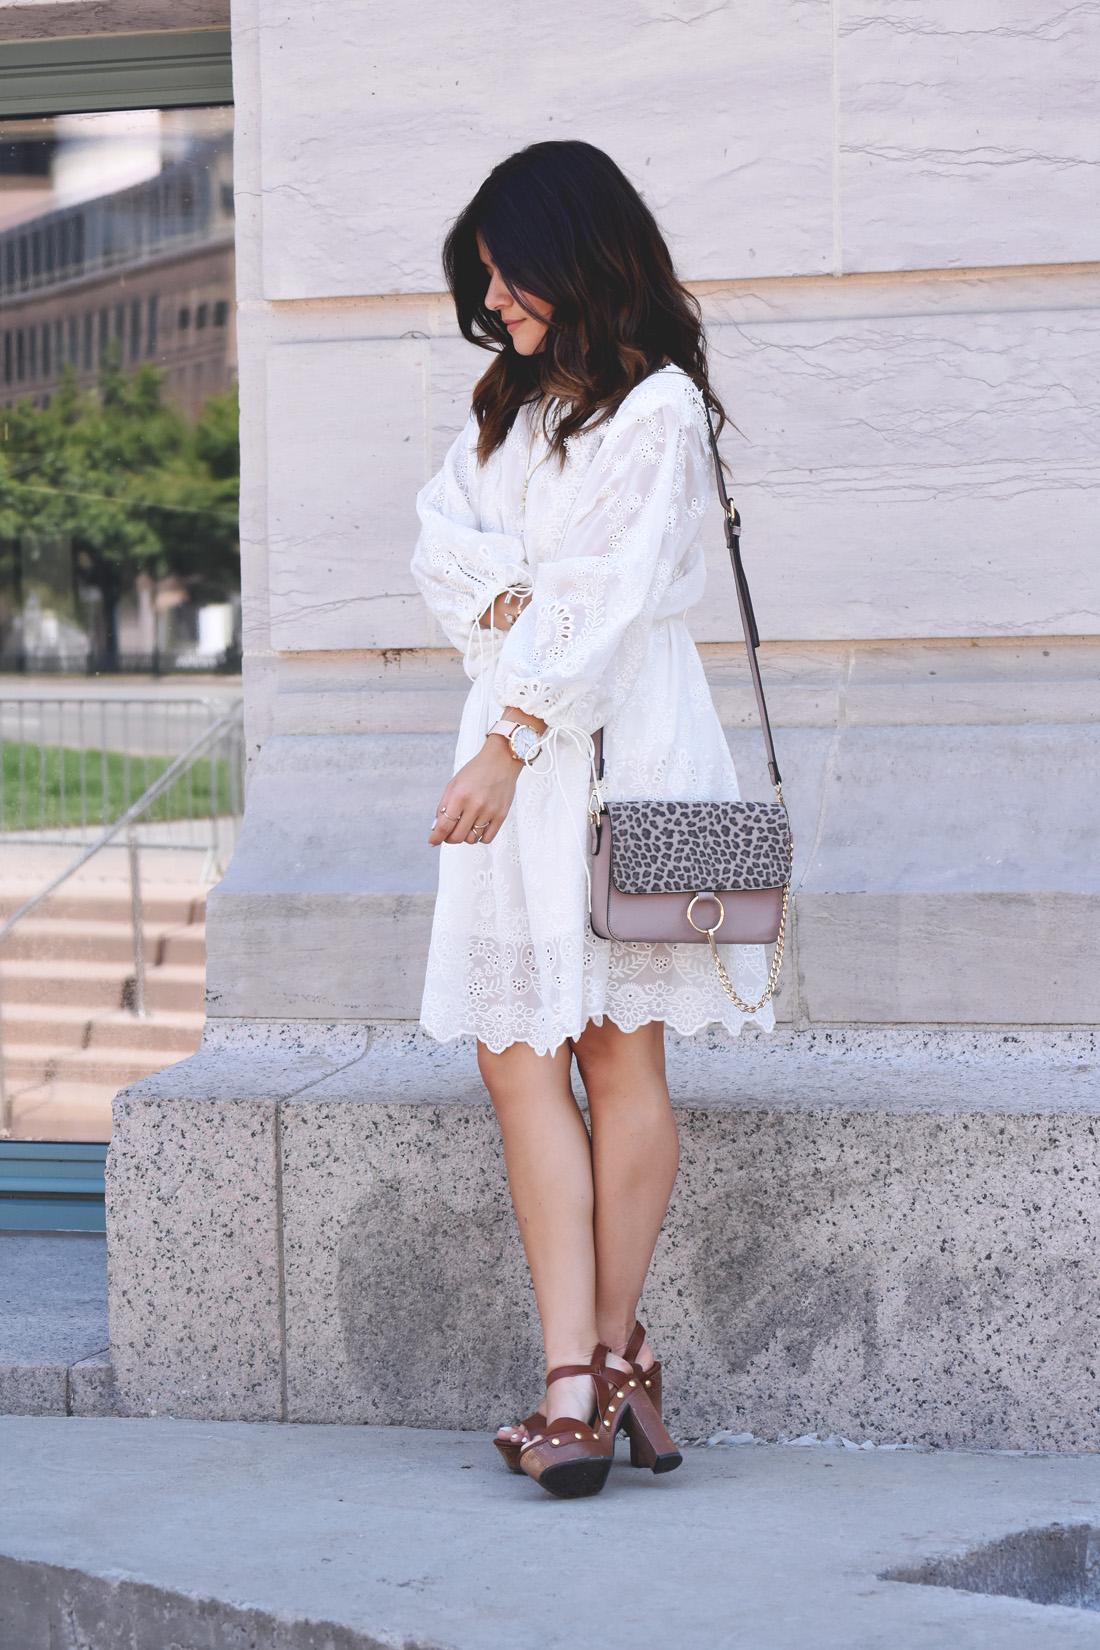 Carolina Hellal of Chic Talk wearing a VIPME white summer dress, wodden platforms and a gray mellow handbag world crossbody bag.